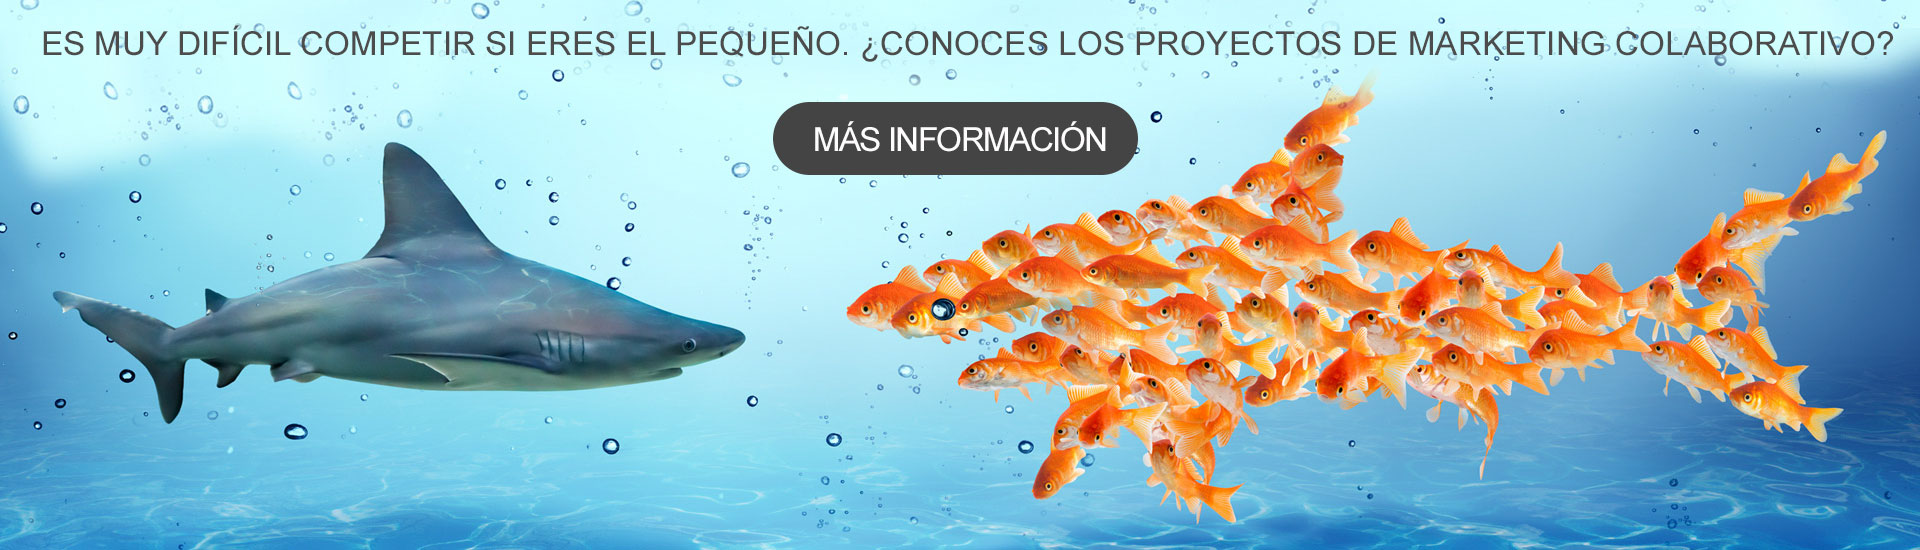 proyectos-economia-colaborativa-portada